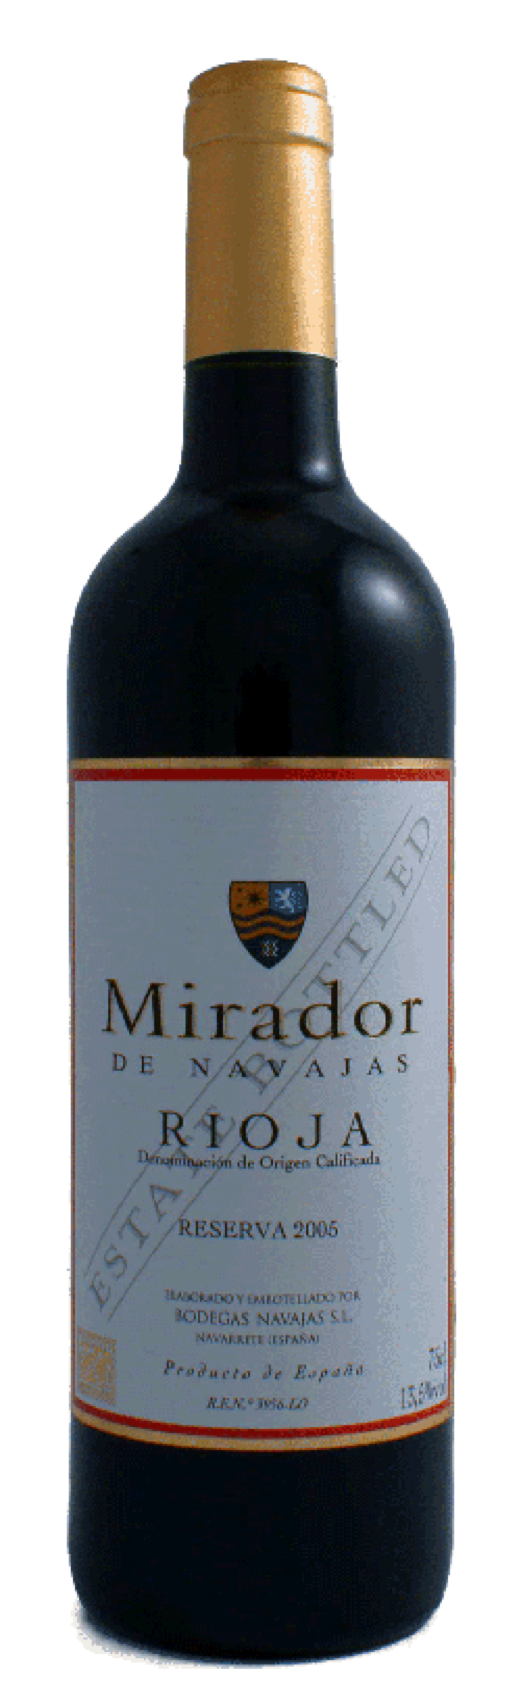 Mirador de Navajas, Rioja Reserva DO, 2011